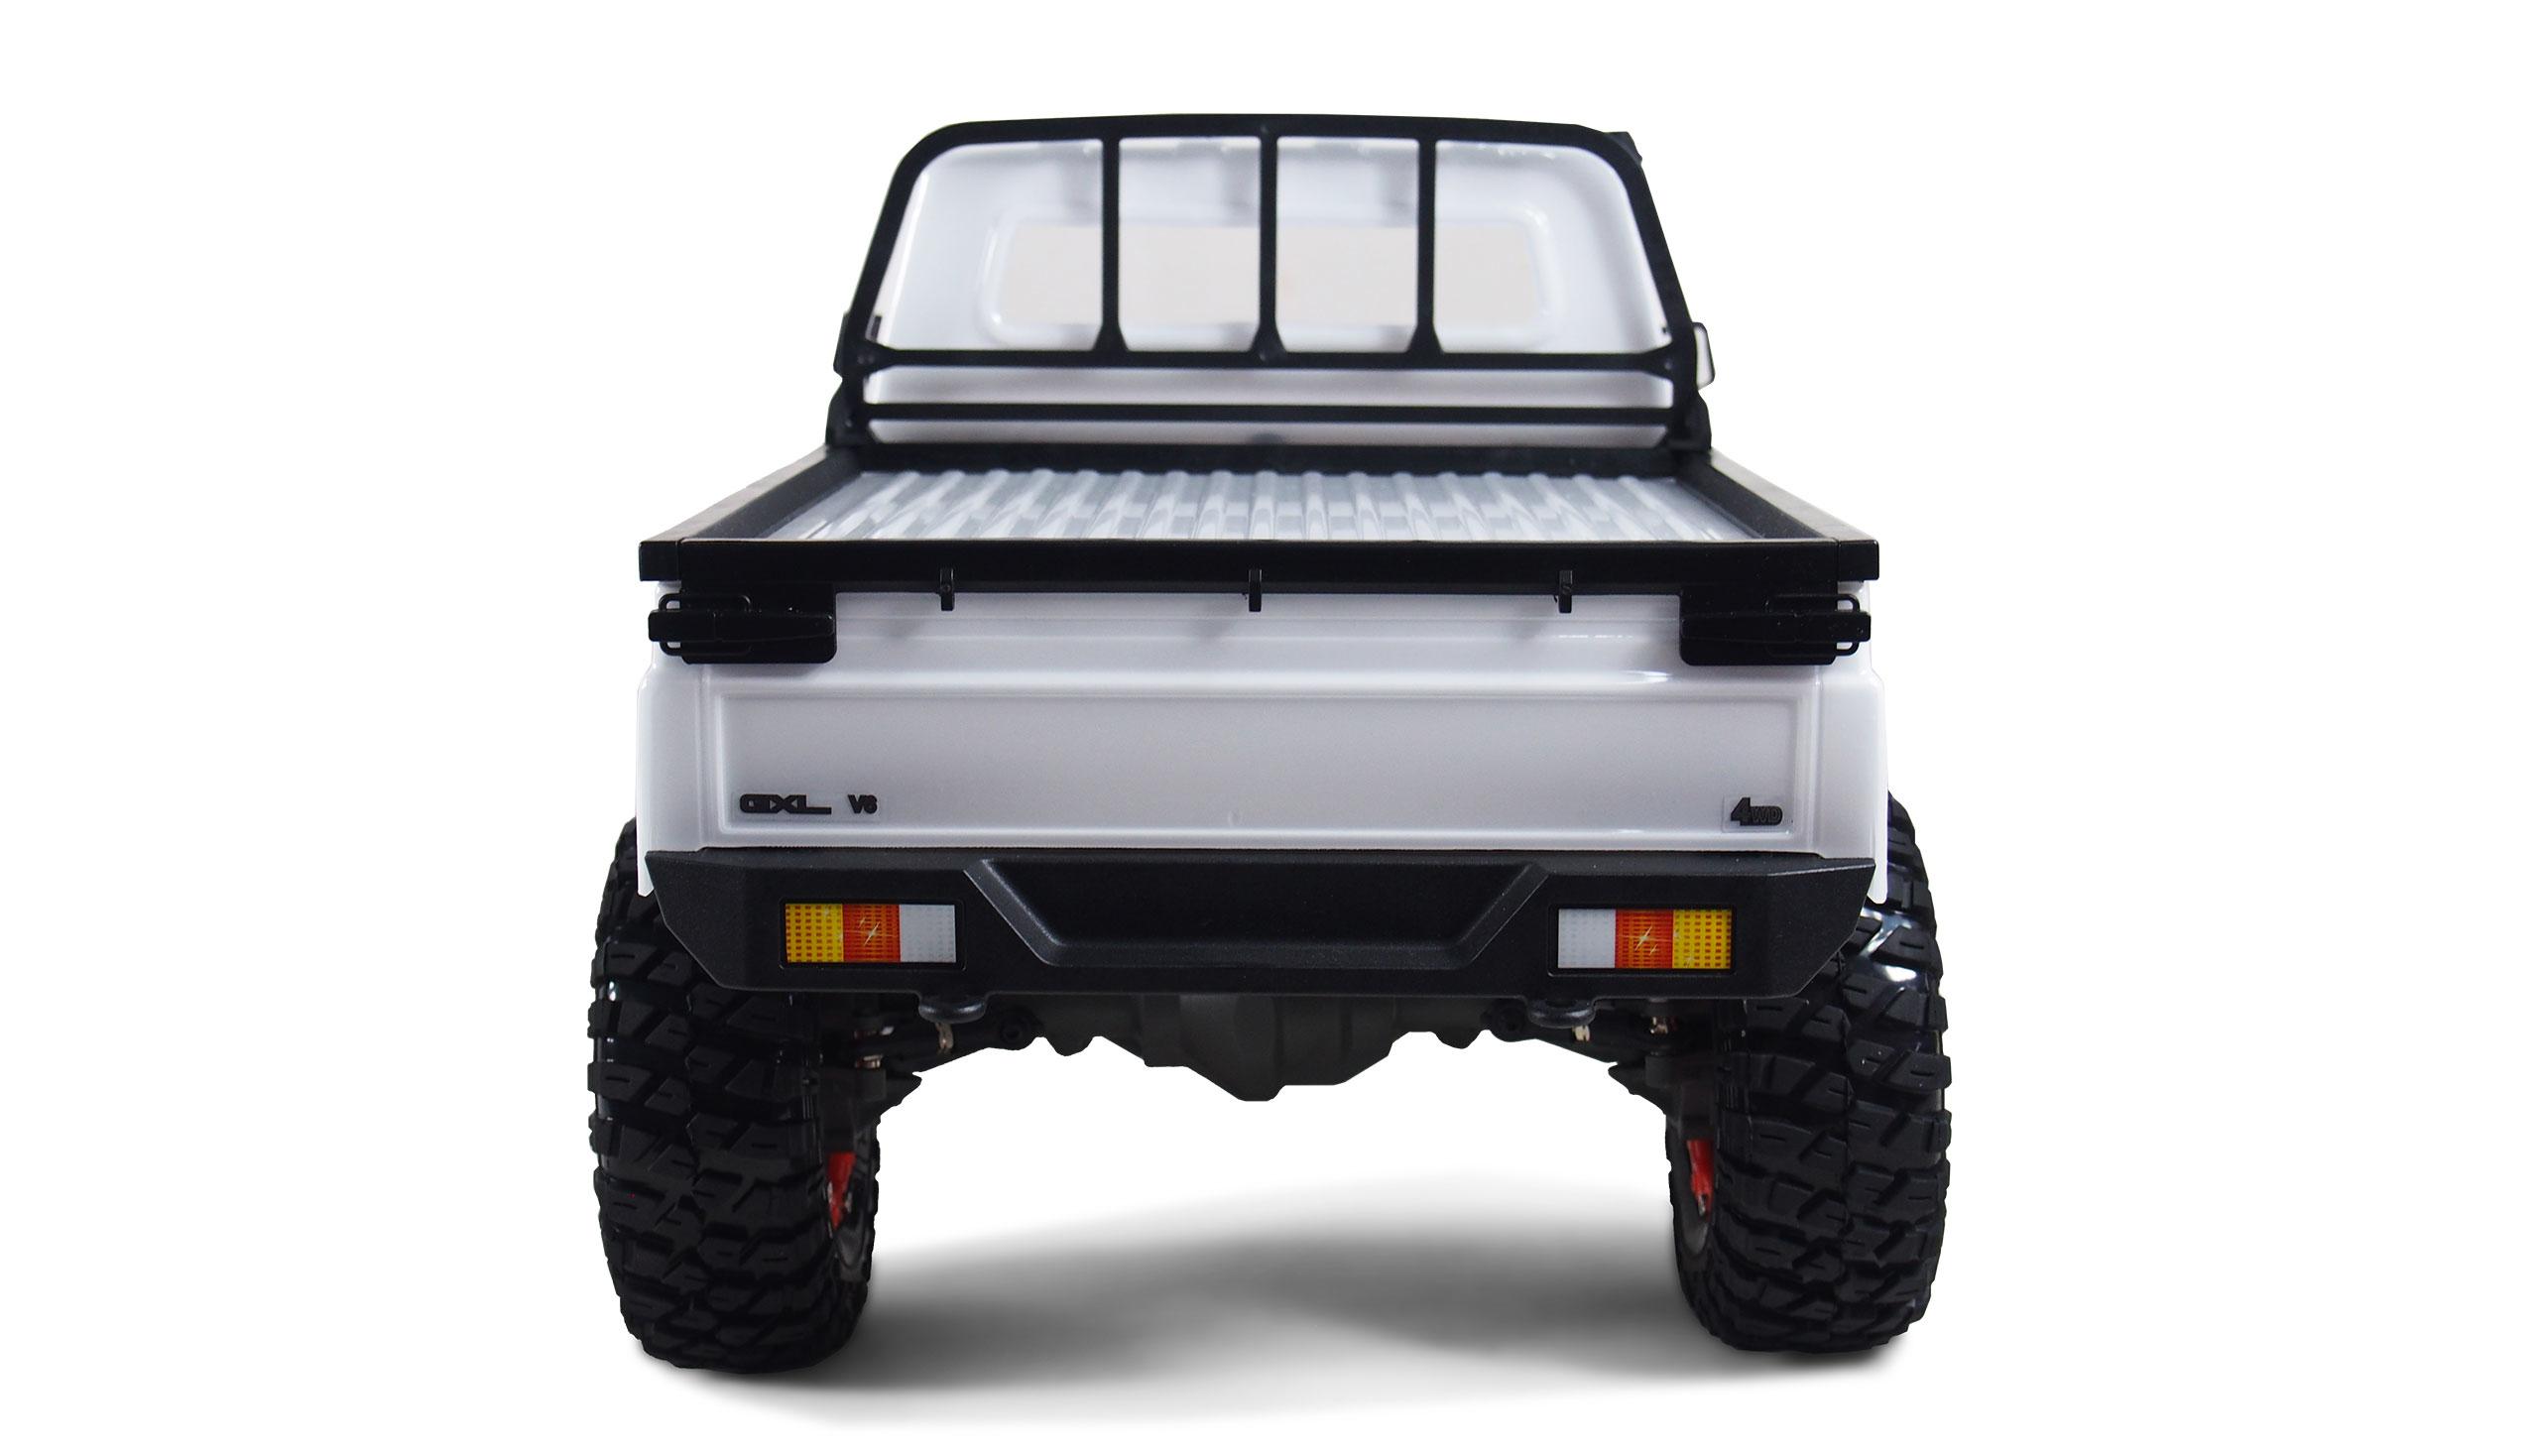 Amewi AMXROCK - Raupenfahrzeug - Elektromotor - 1:10 - Betriebsbereit (RTR) - Schwarz - Weiß - Aluminium - Metall